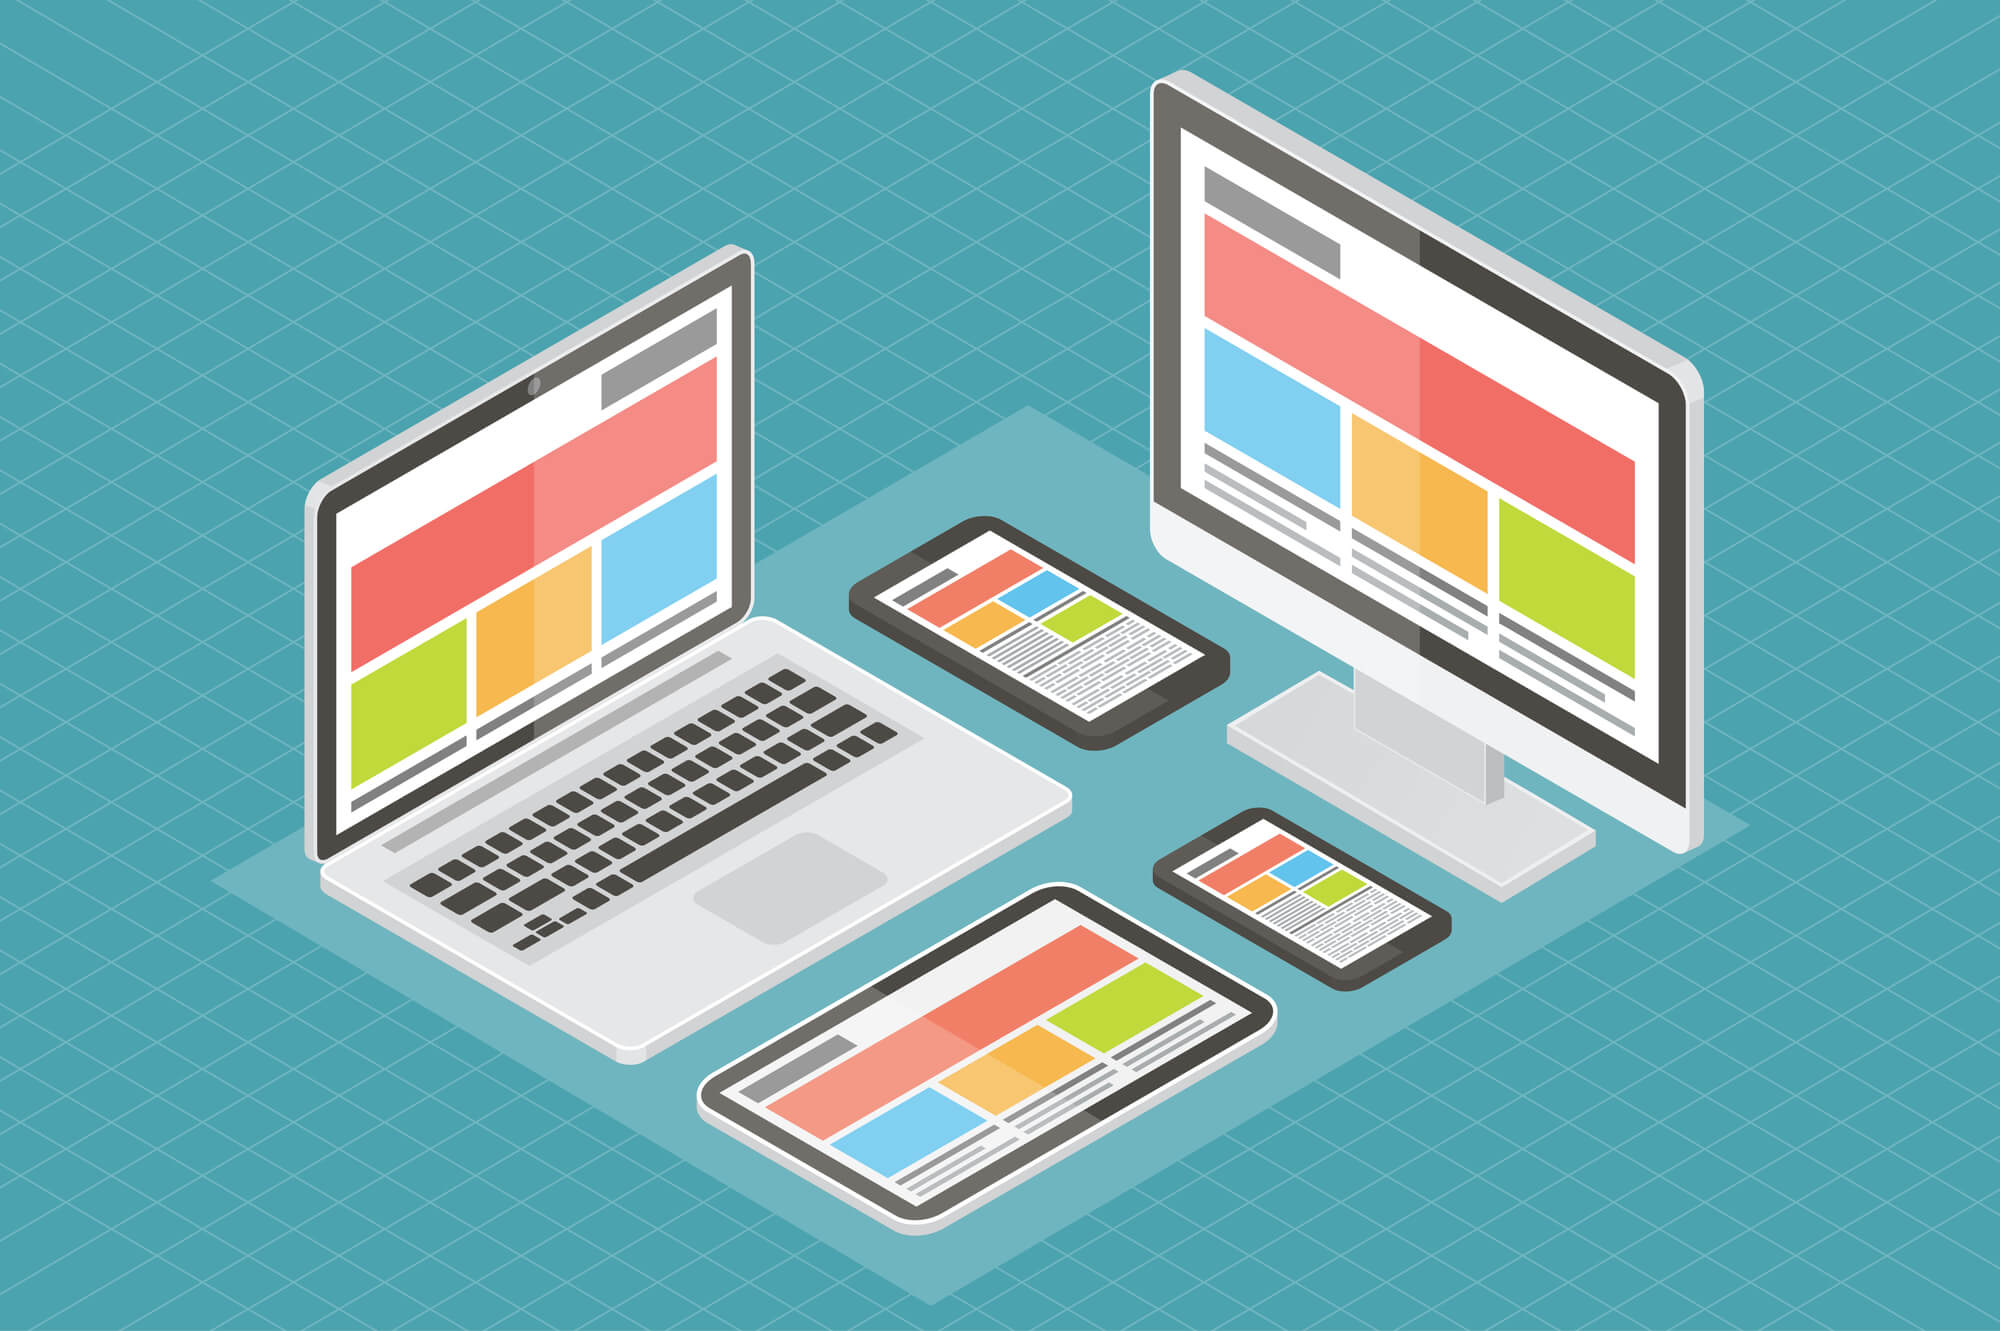 web-design-computer-equpment-mobile-phone